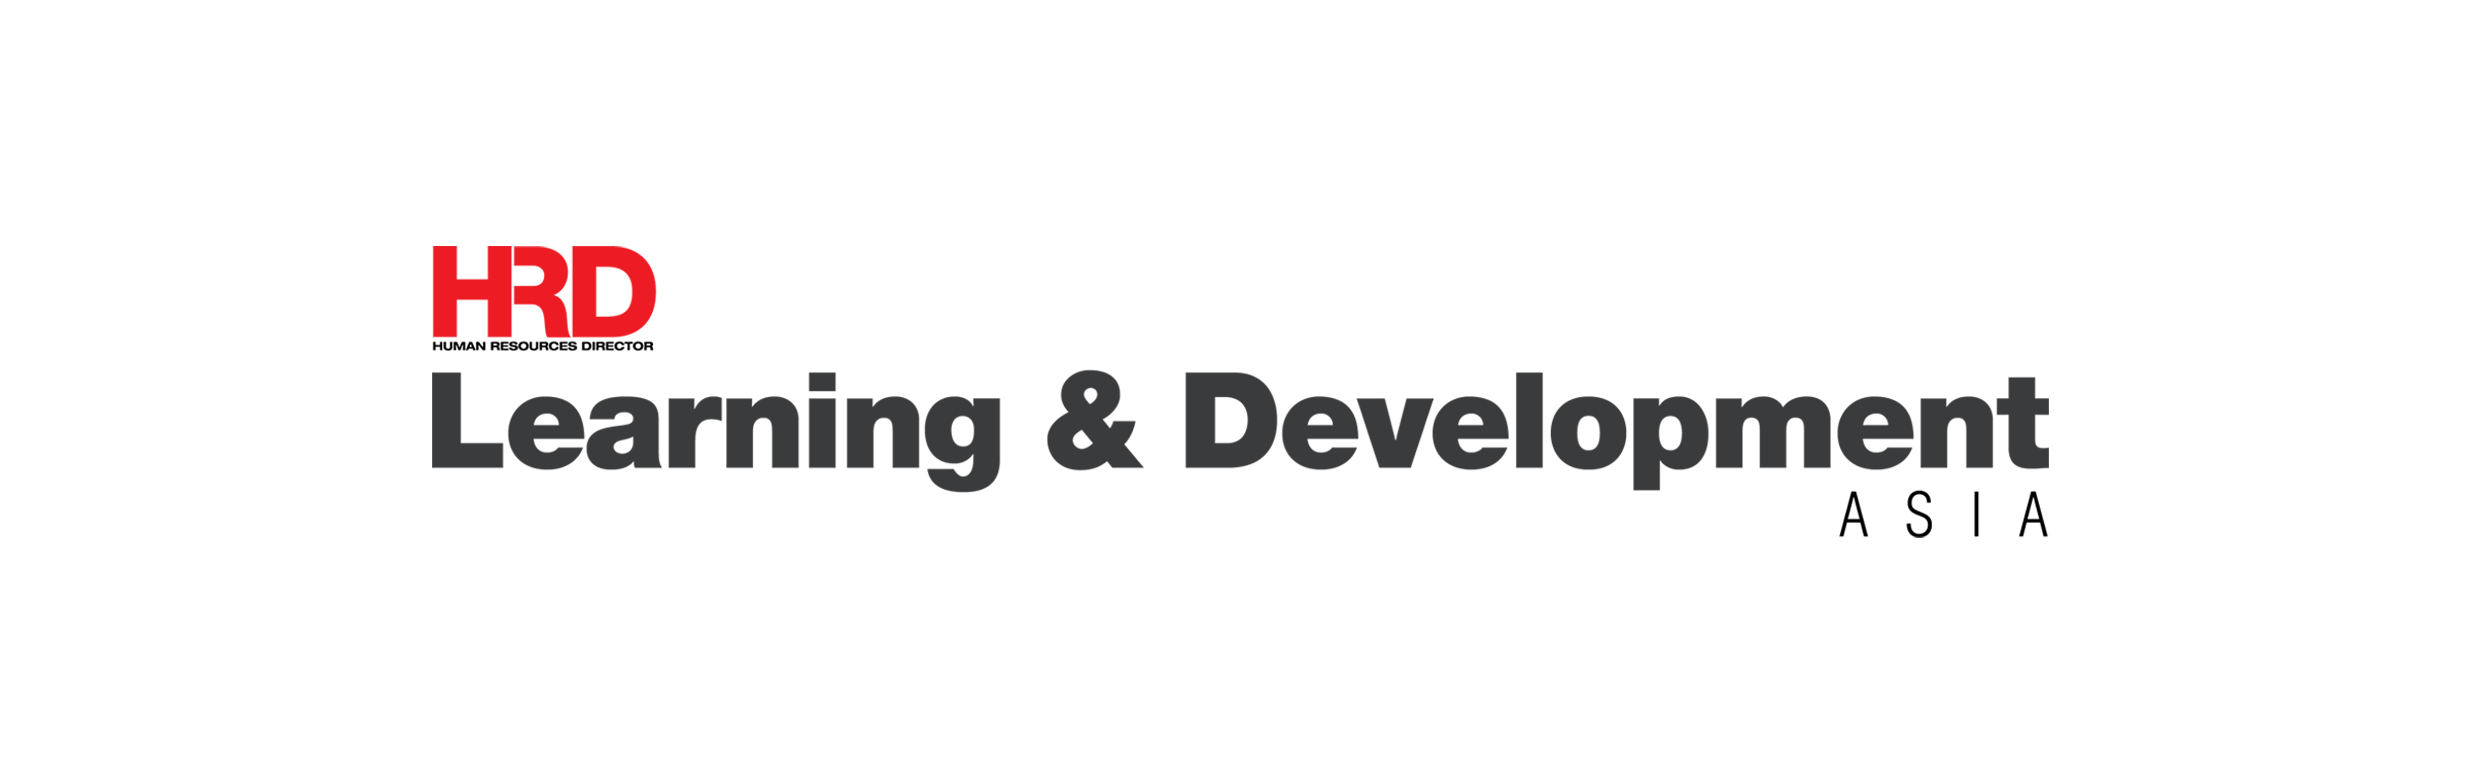 Learning & Development Asia